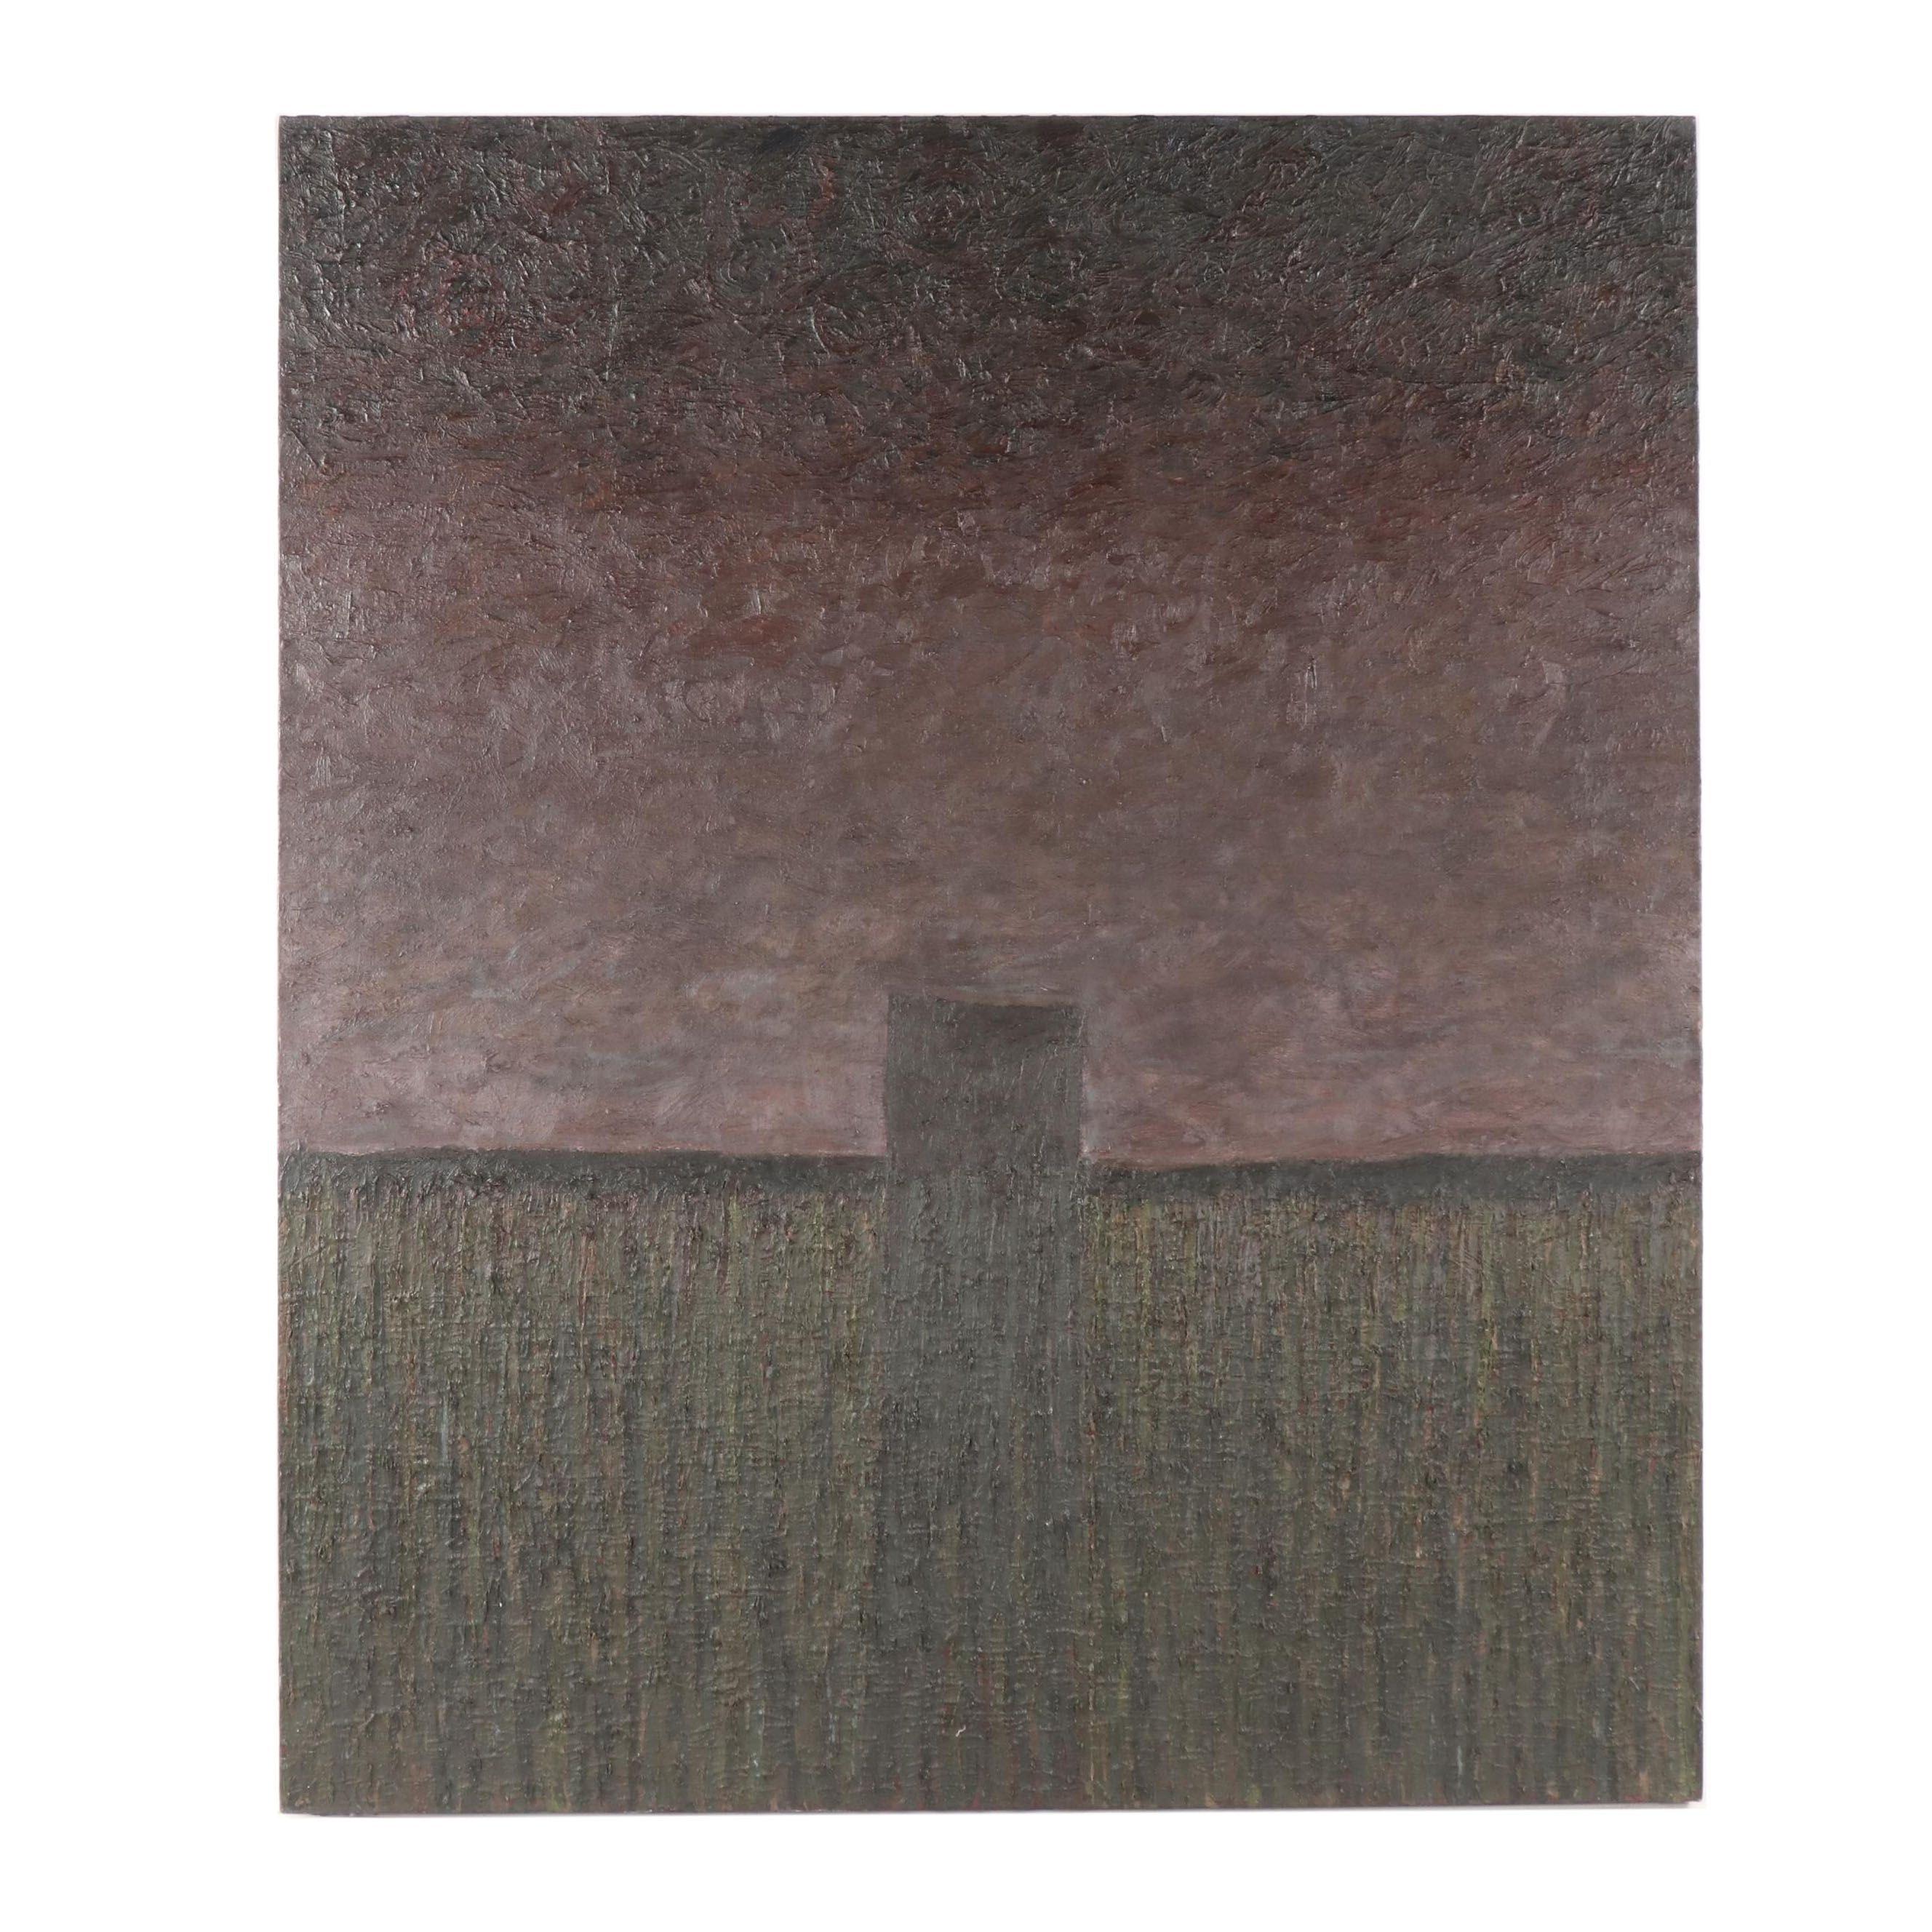 "John Cleaveland Oil Painting ""Fortile Grond"""